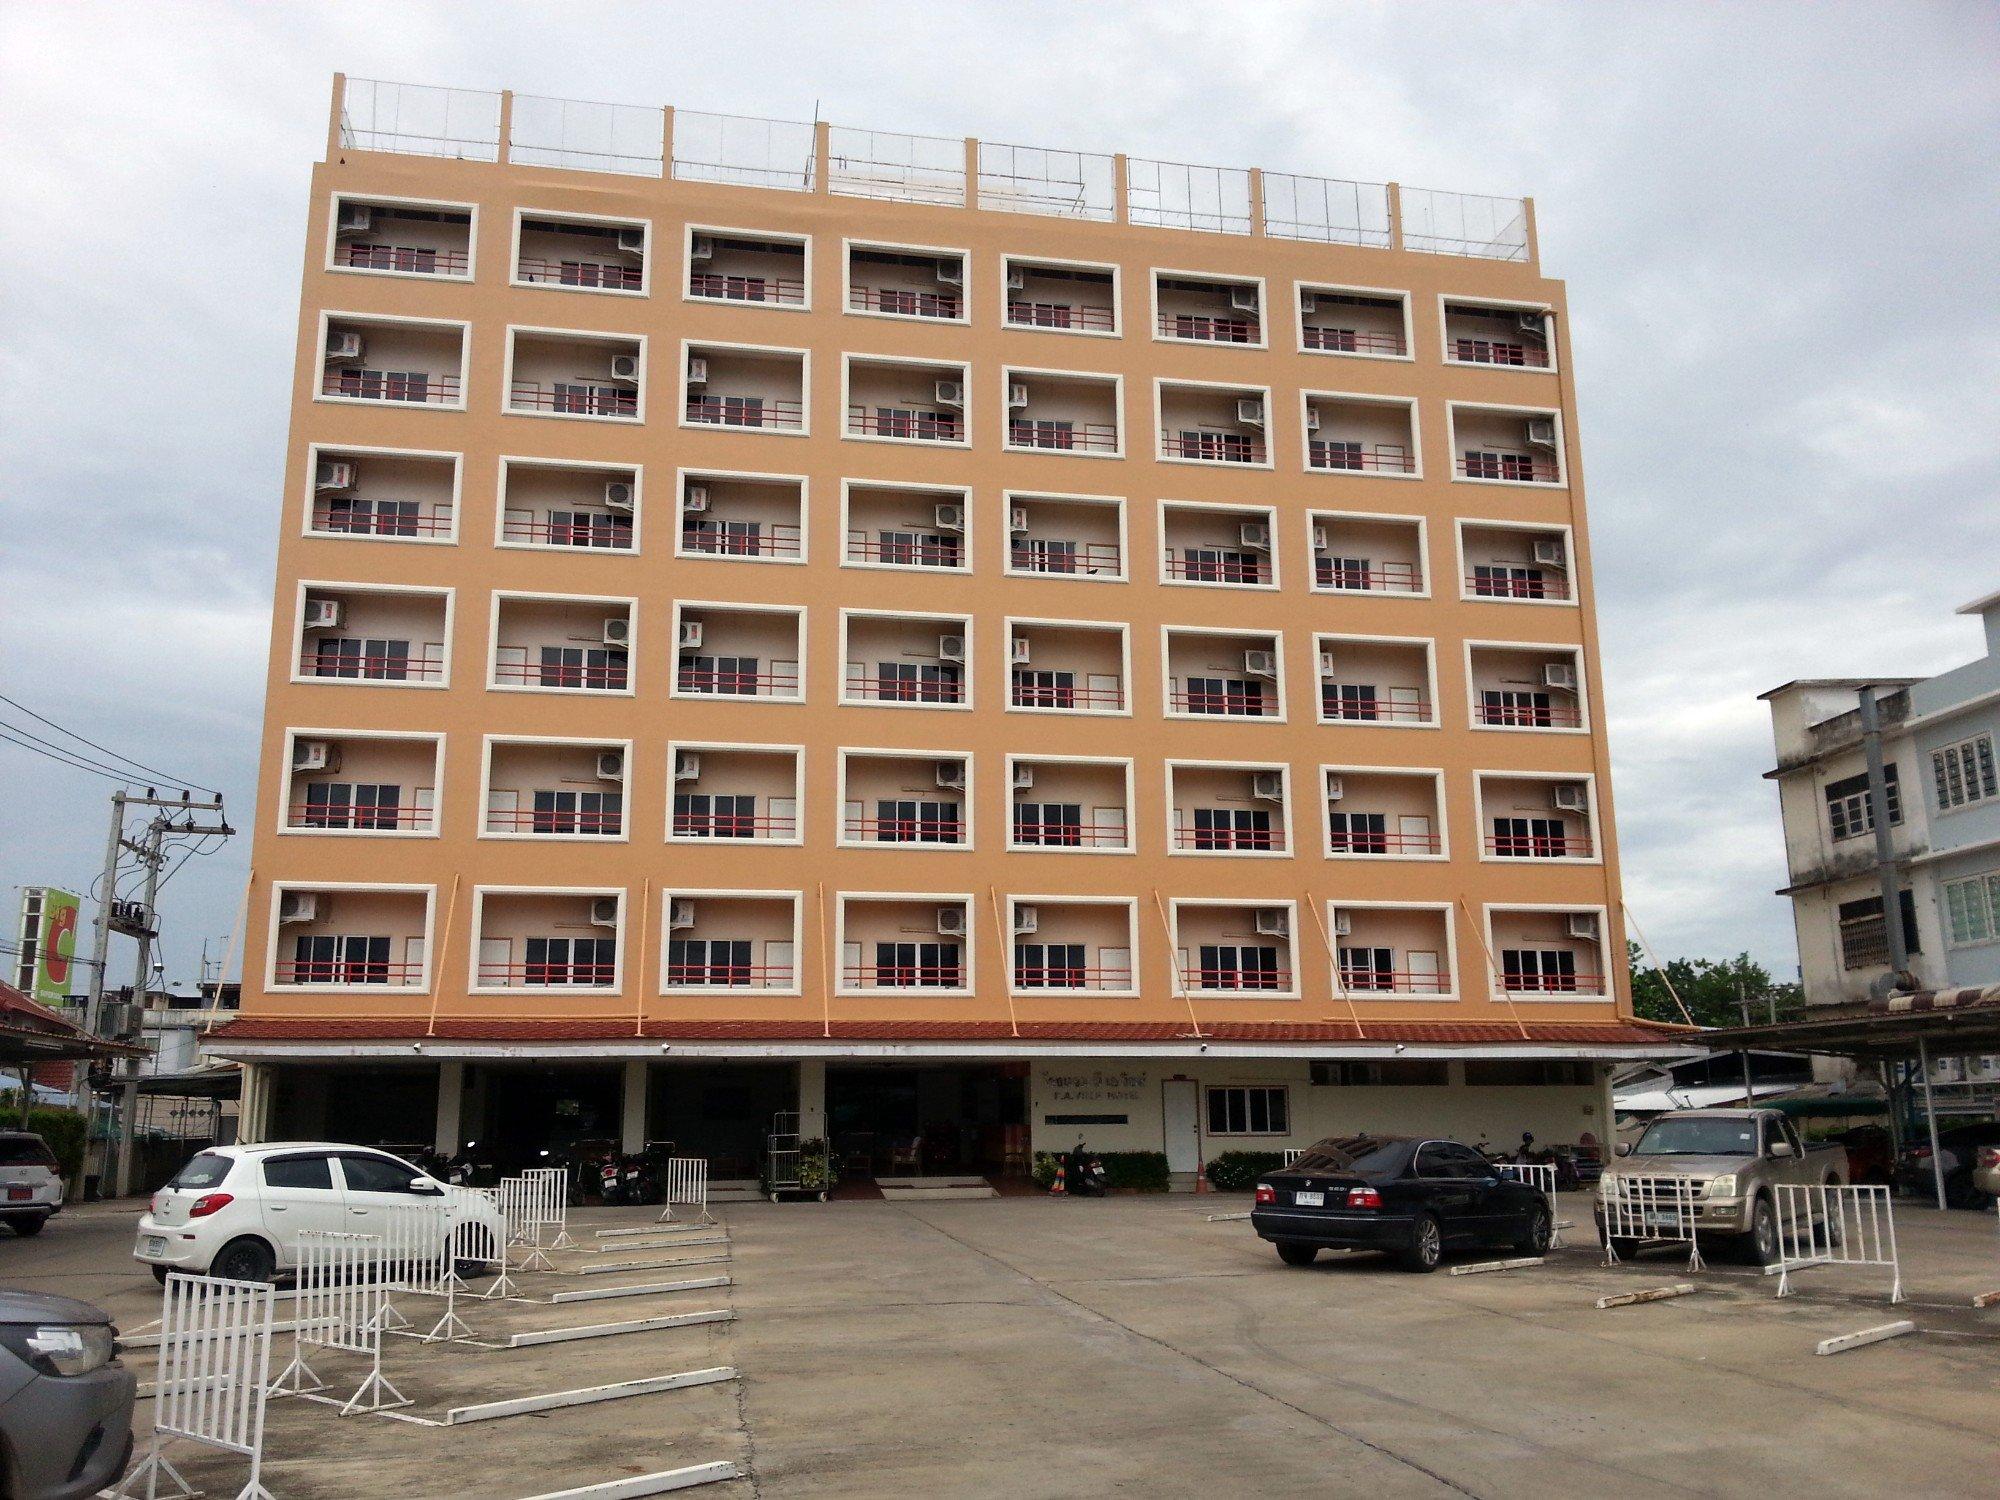 P.A. Ville Hotel in Nakhon Sawan